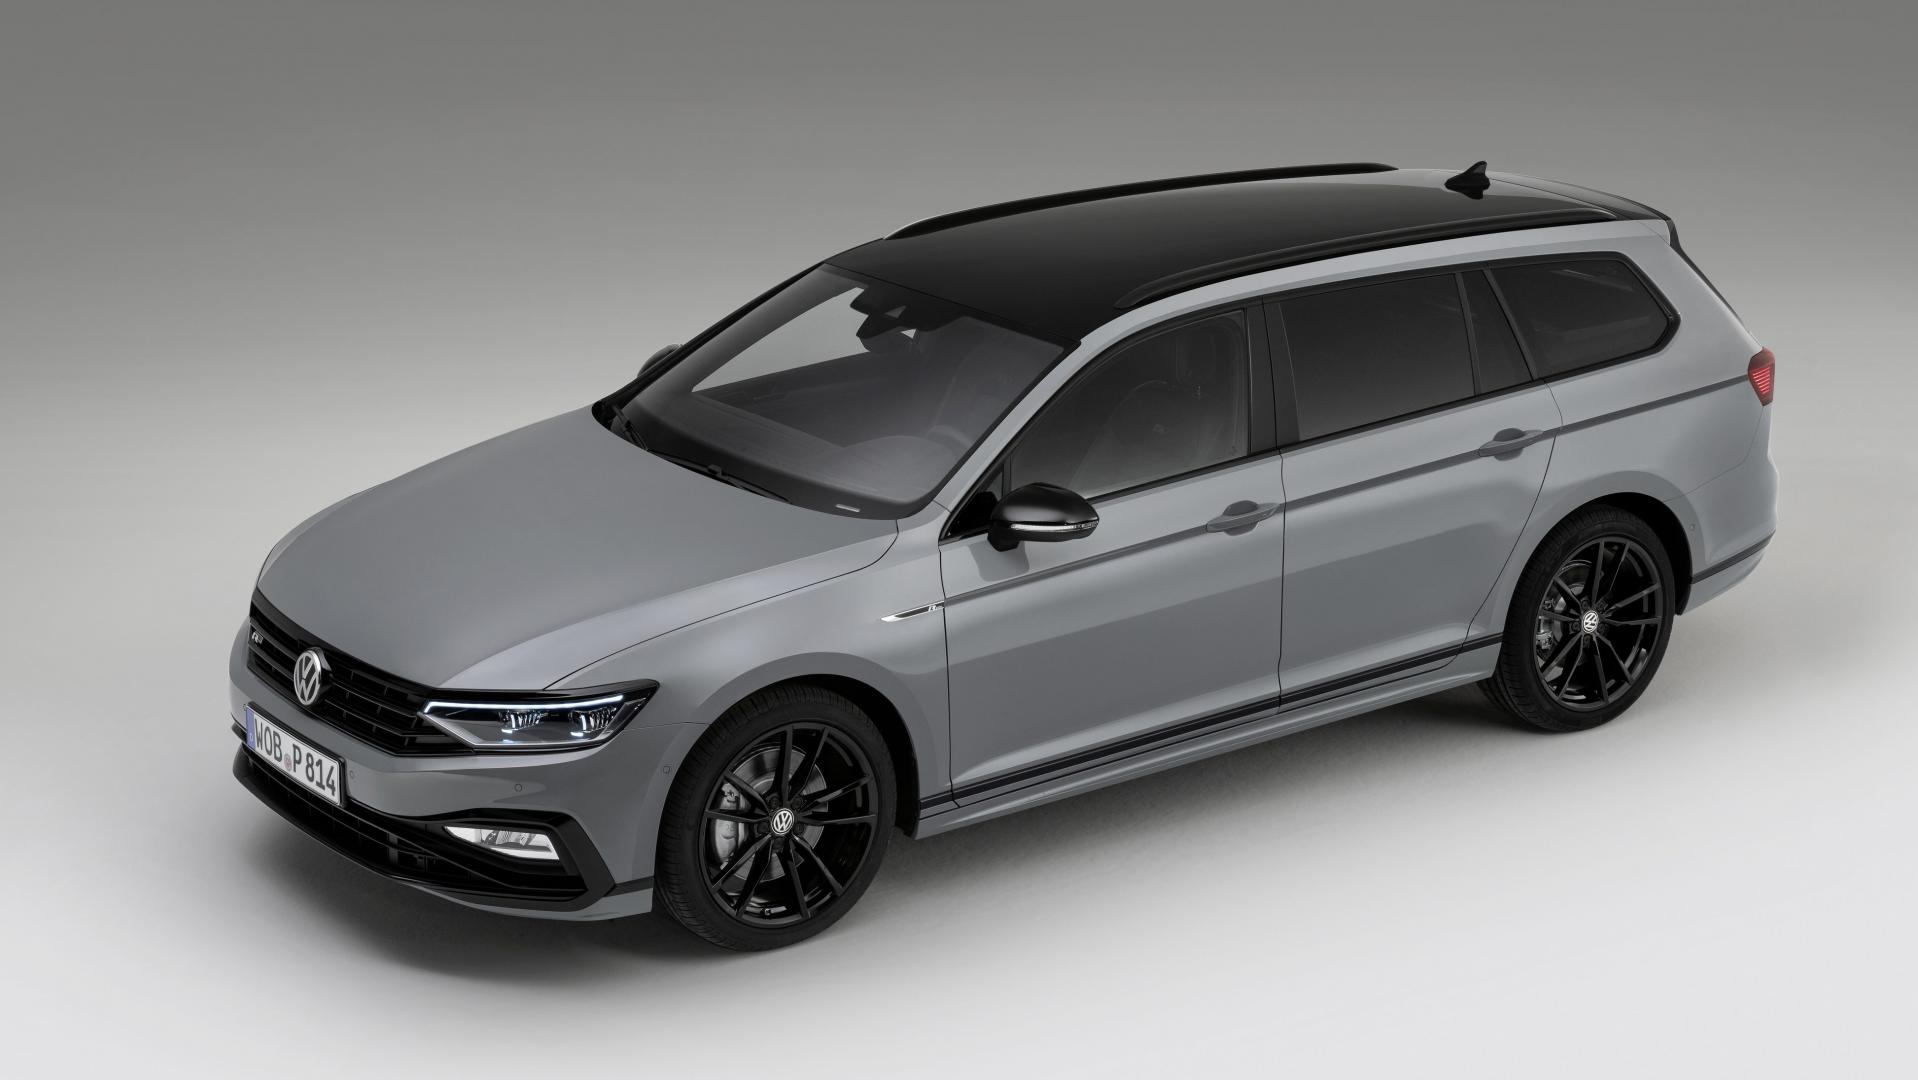 Volkswagen Passat R-Line Edition 2019